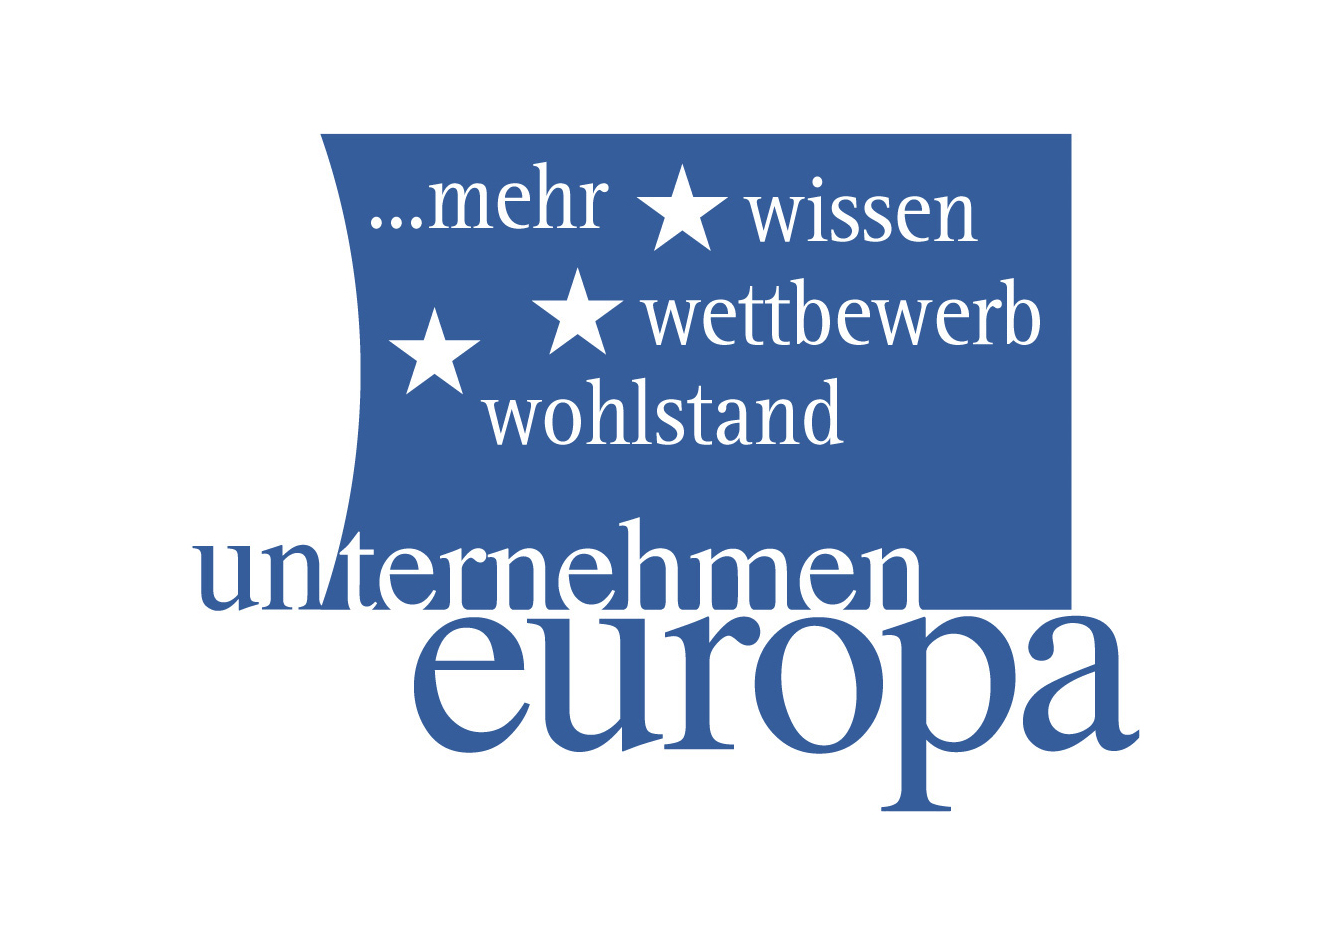 Unternehmen Europa